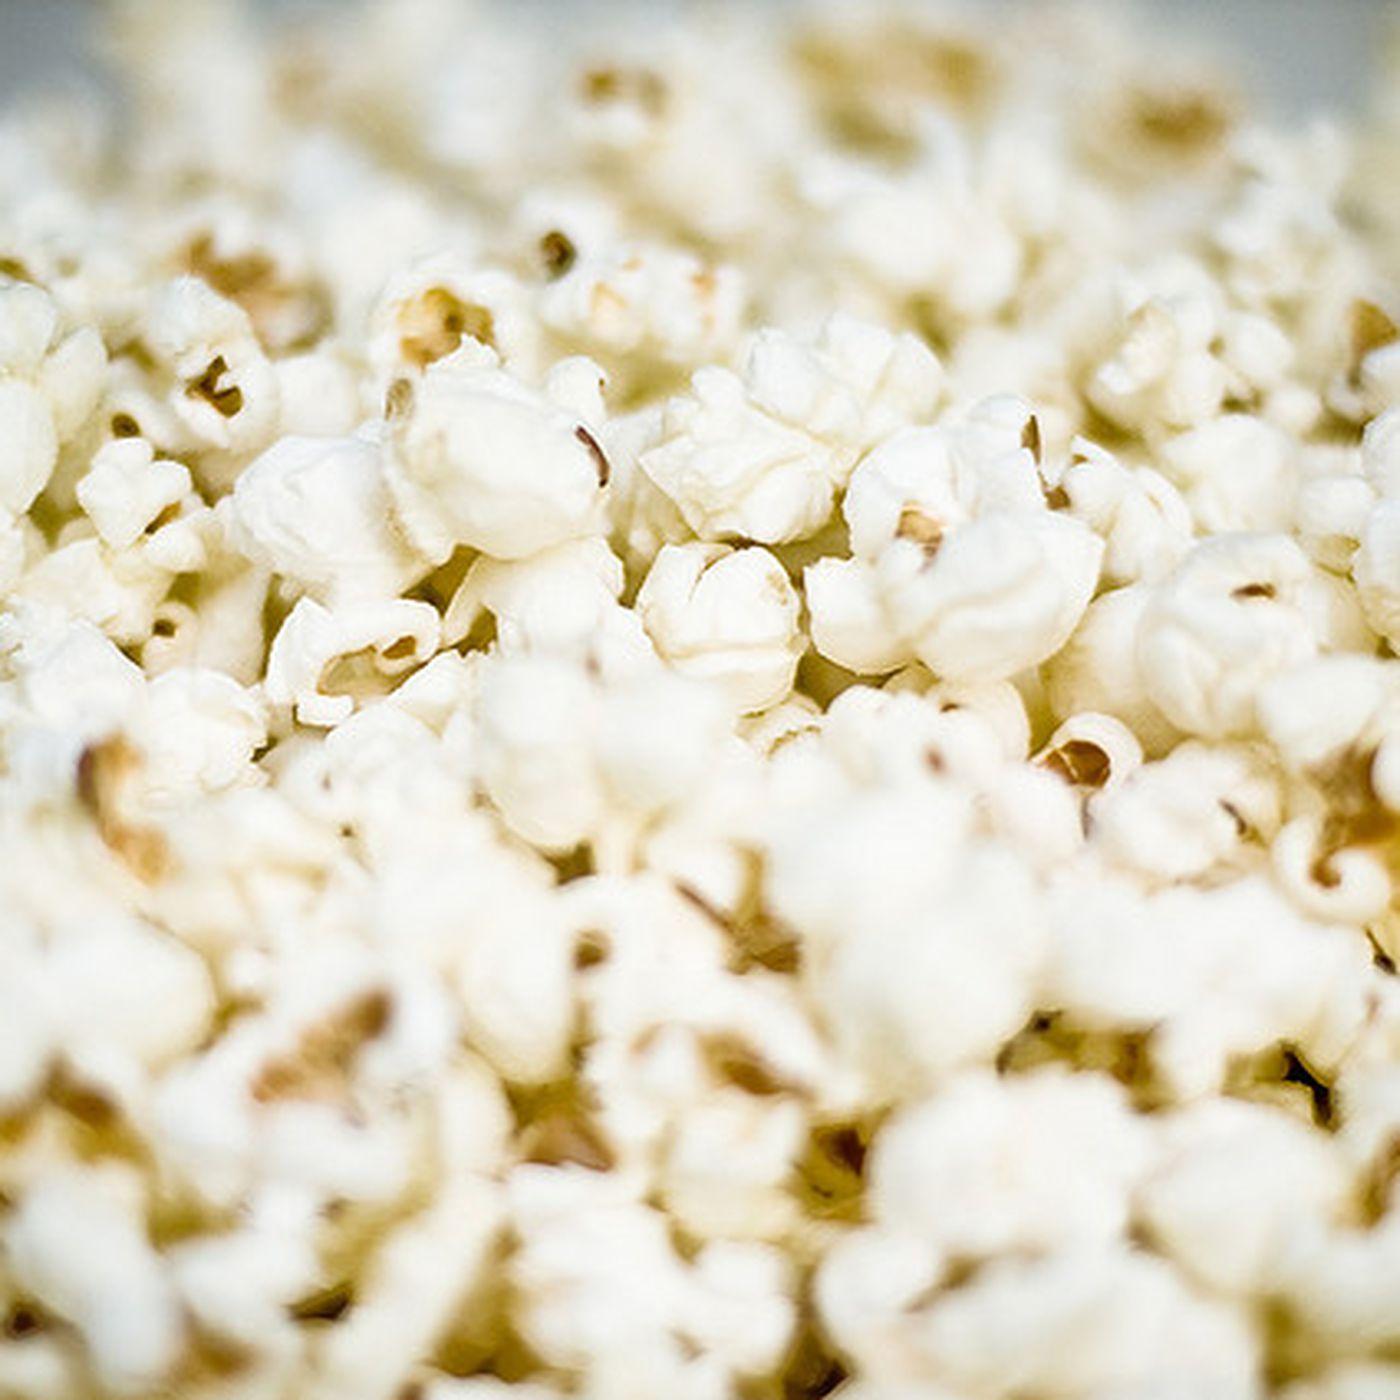 Piracy service Popcorn Time now has a legal alternative